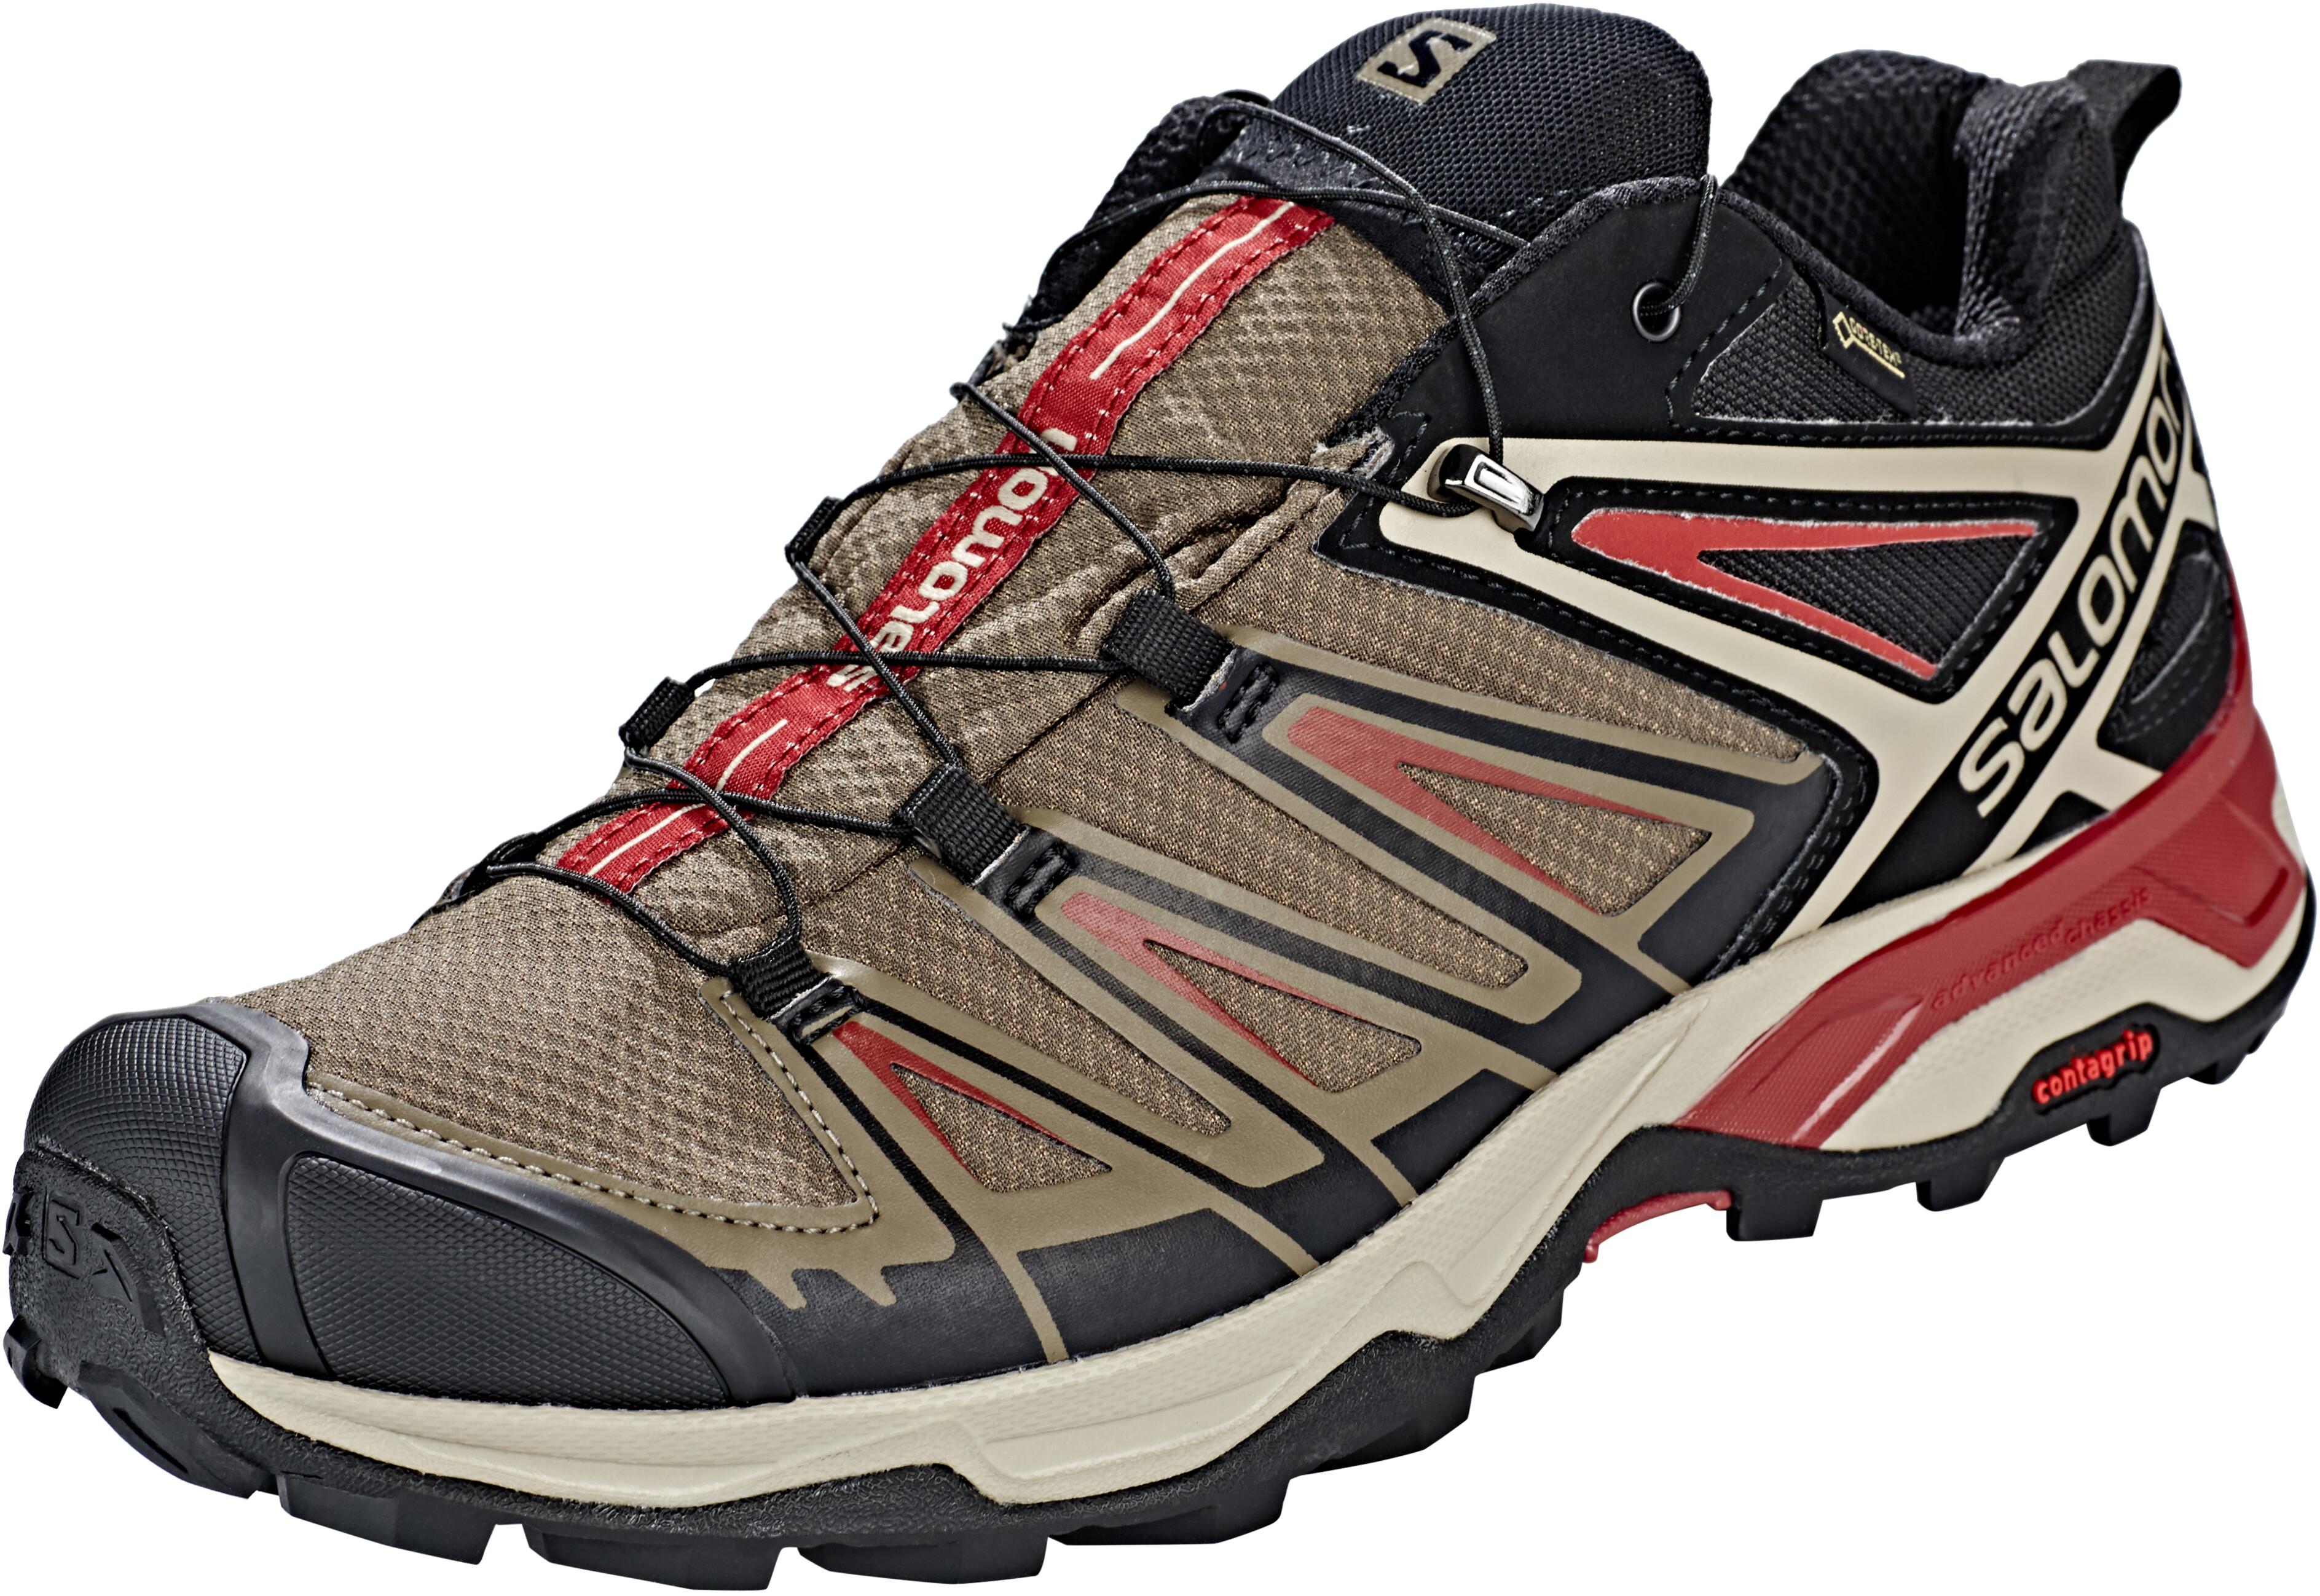 premium selection c63cf 20564 Salomon X Ultra 3 GTX Shoes Men bungee cord/vintage kaki/red dahlia